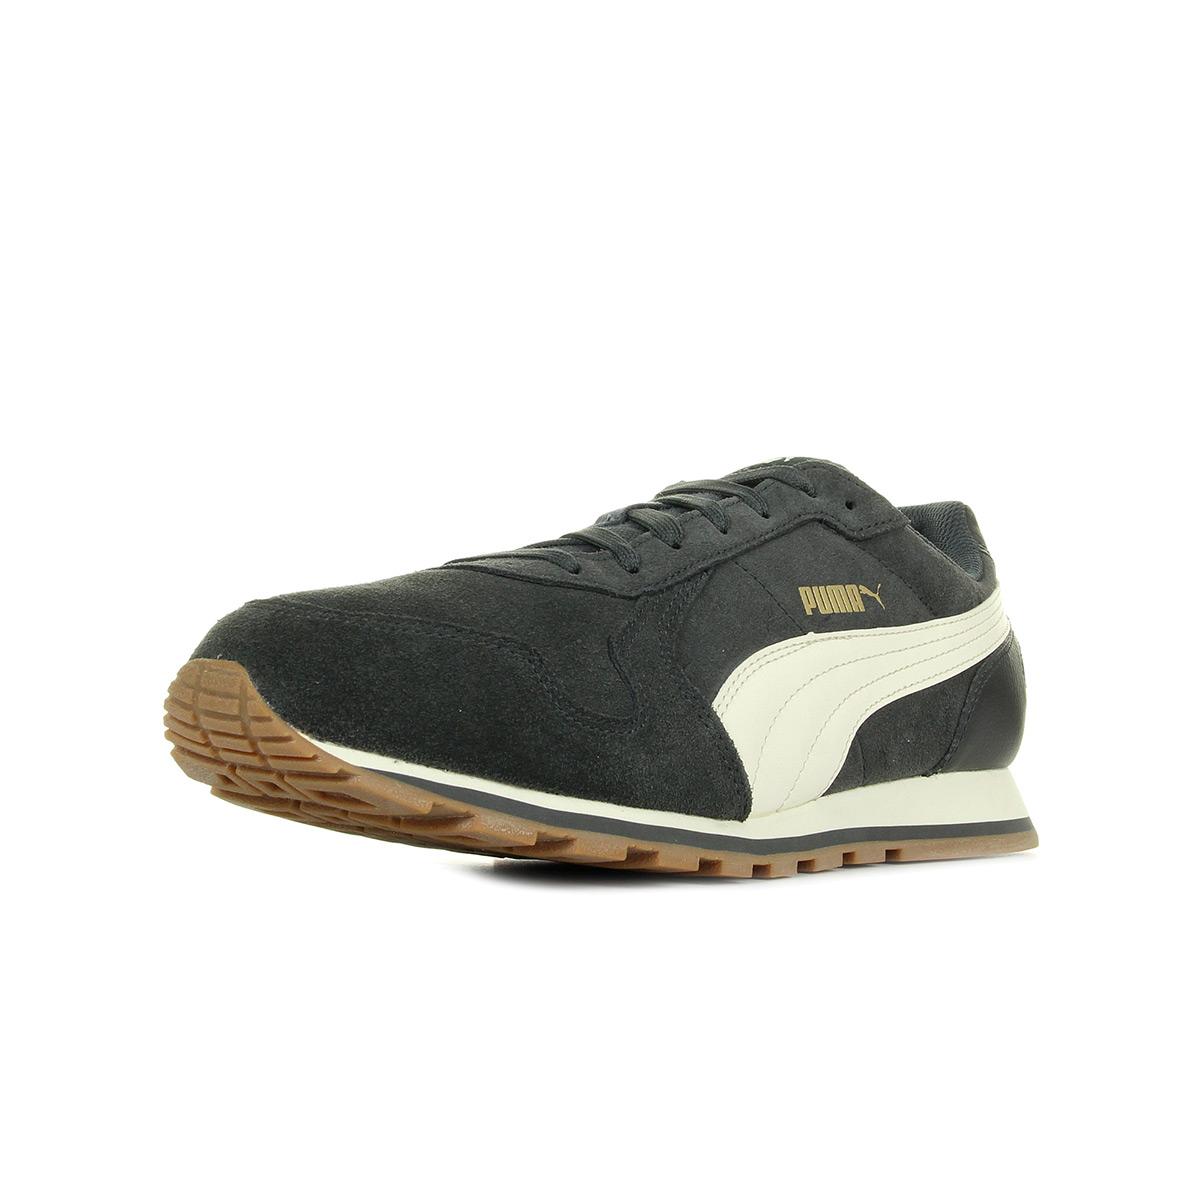 Puma ST Runner SD gris - Chaussures Baskets basses Homme